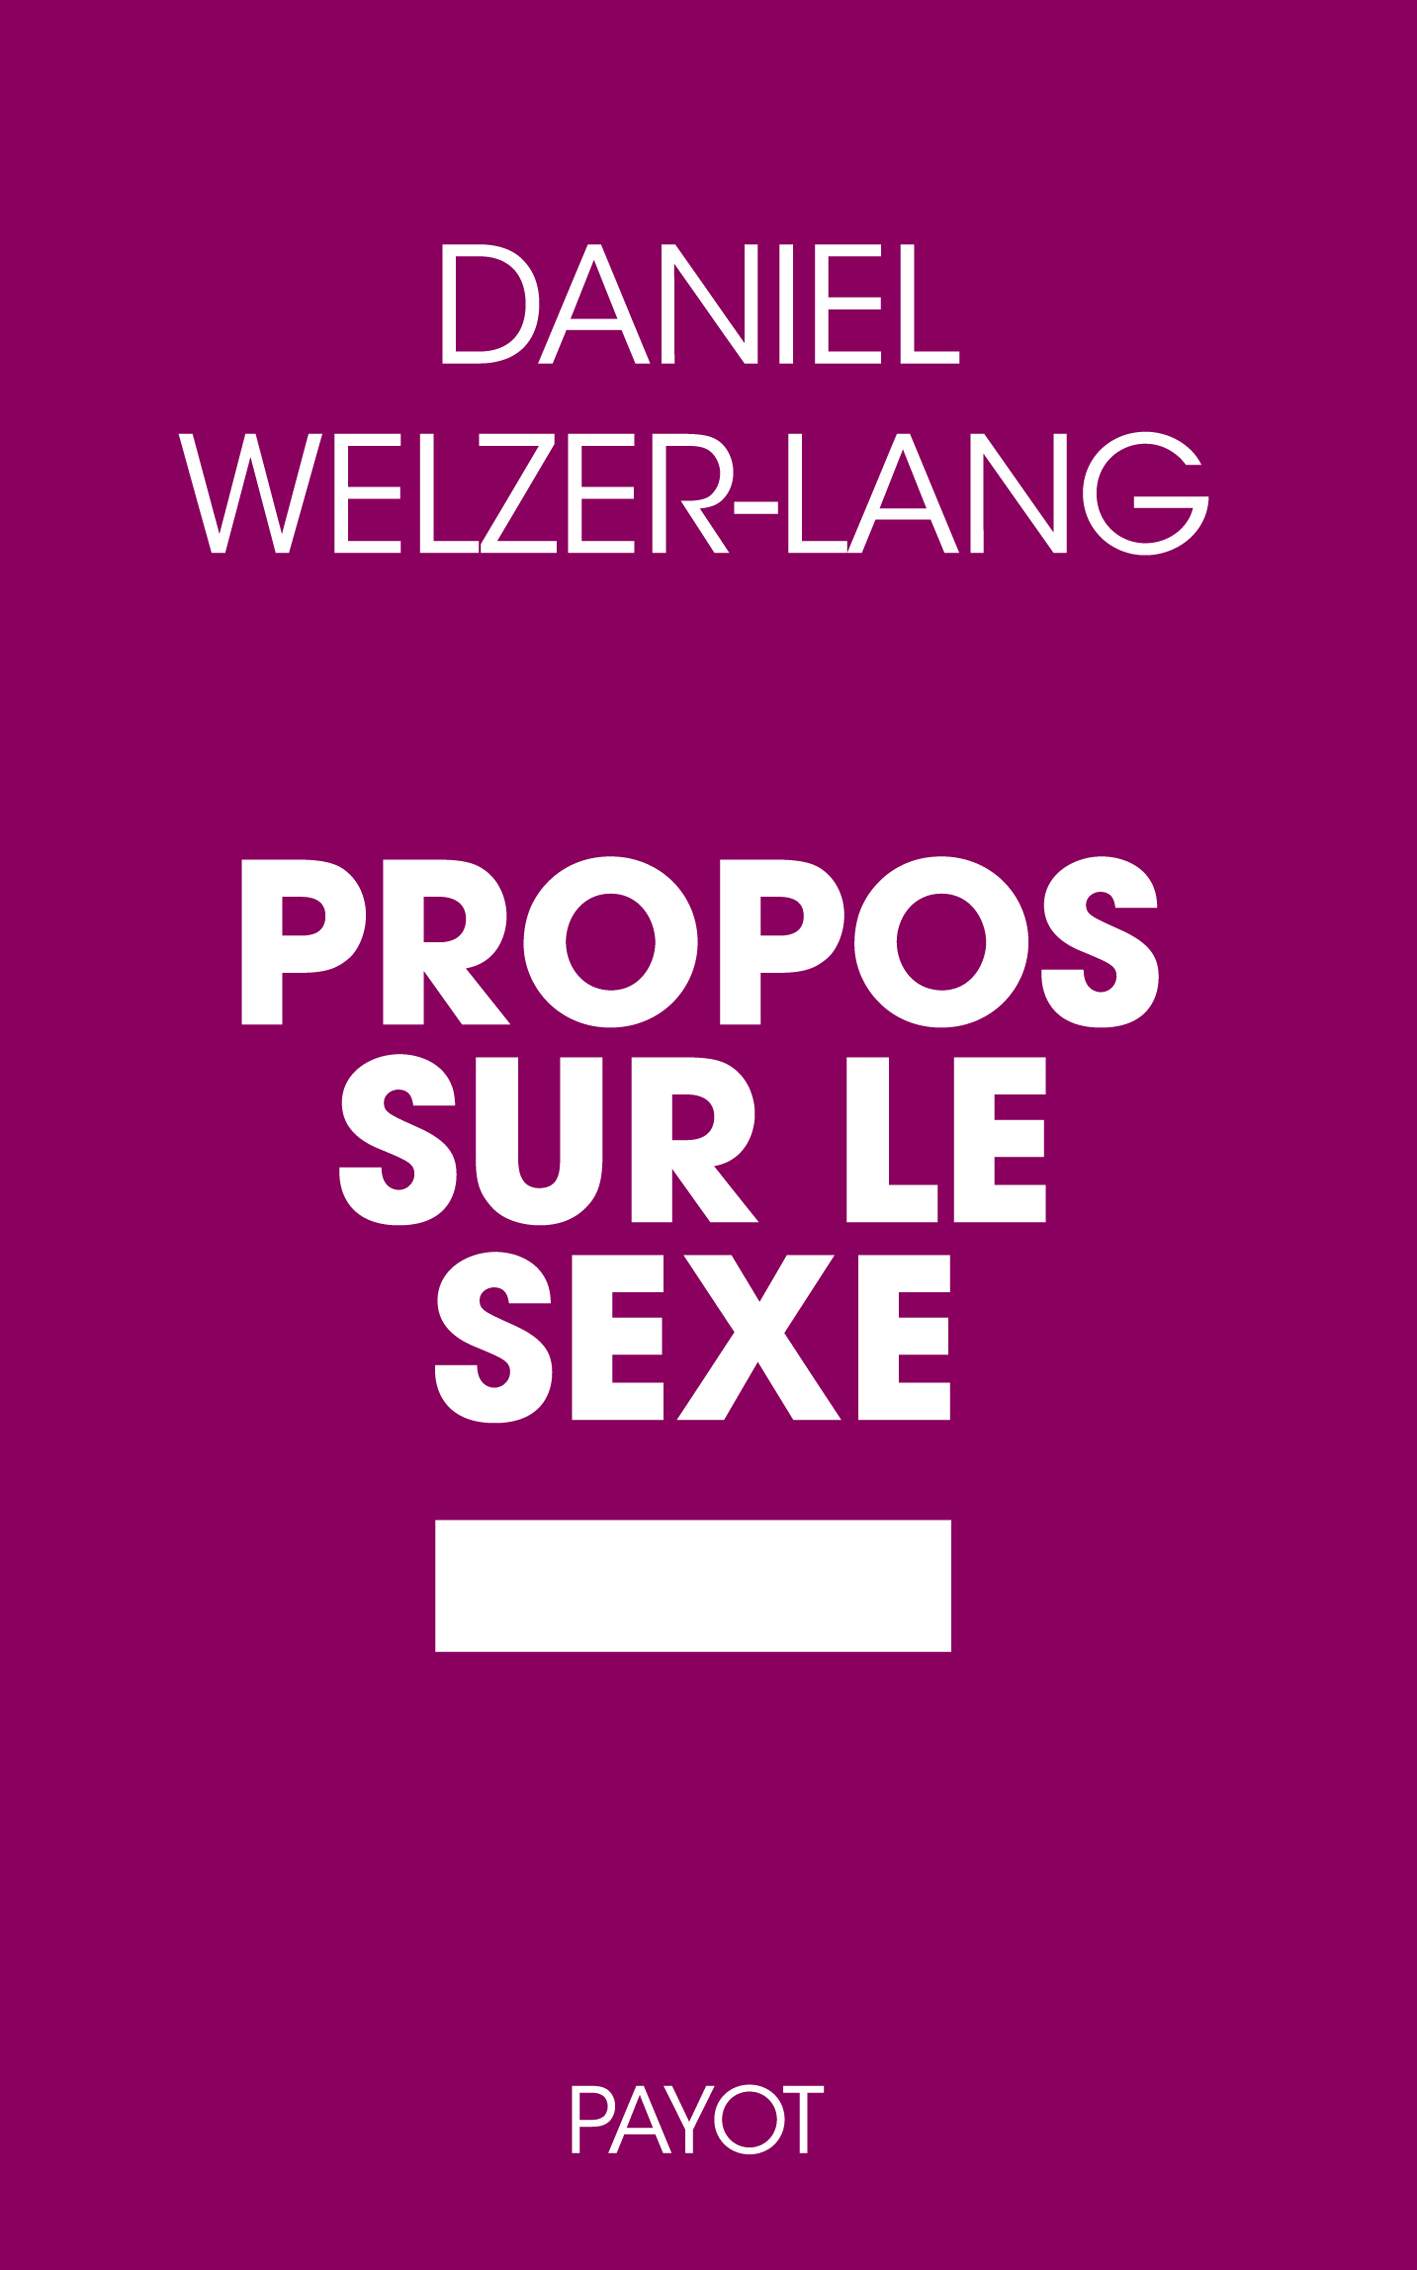 2014-03-21-WelzerLang_Propossurlesexe_couv.jpg